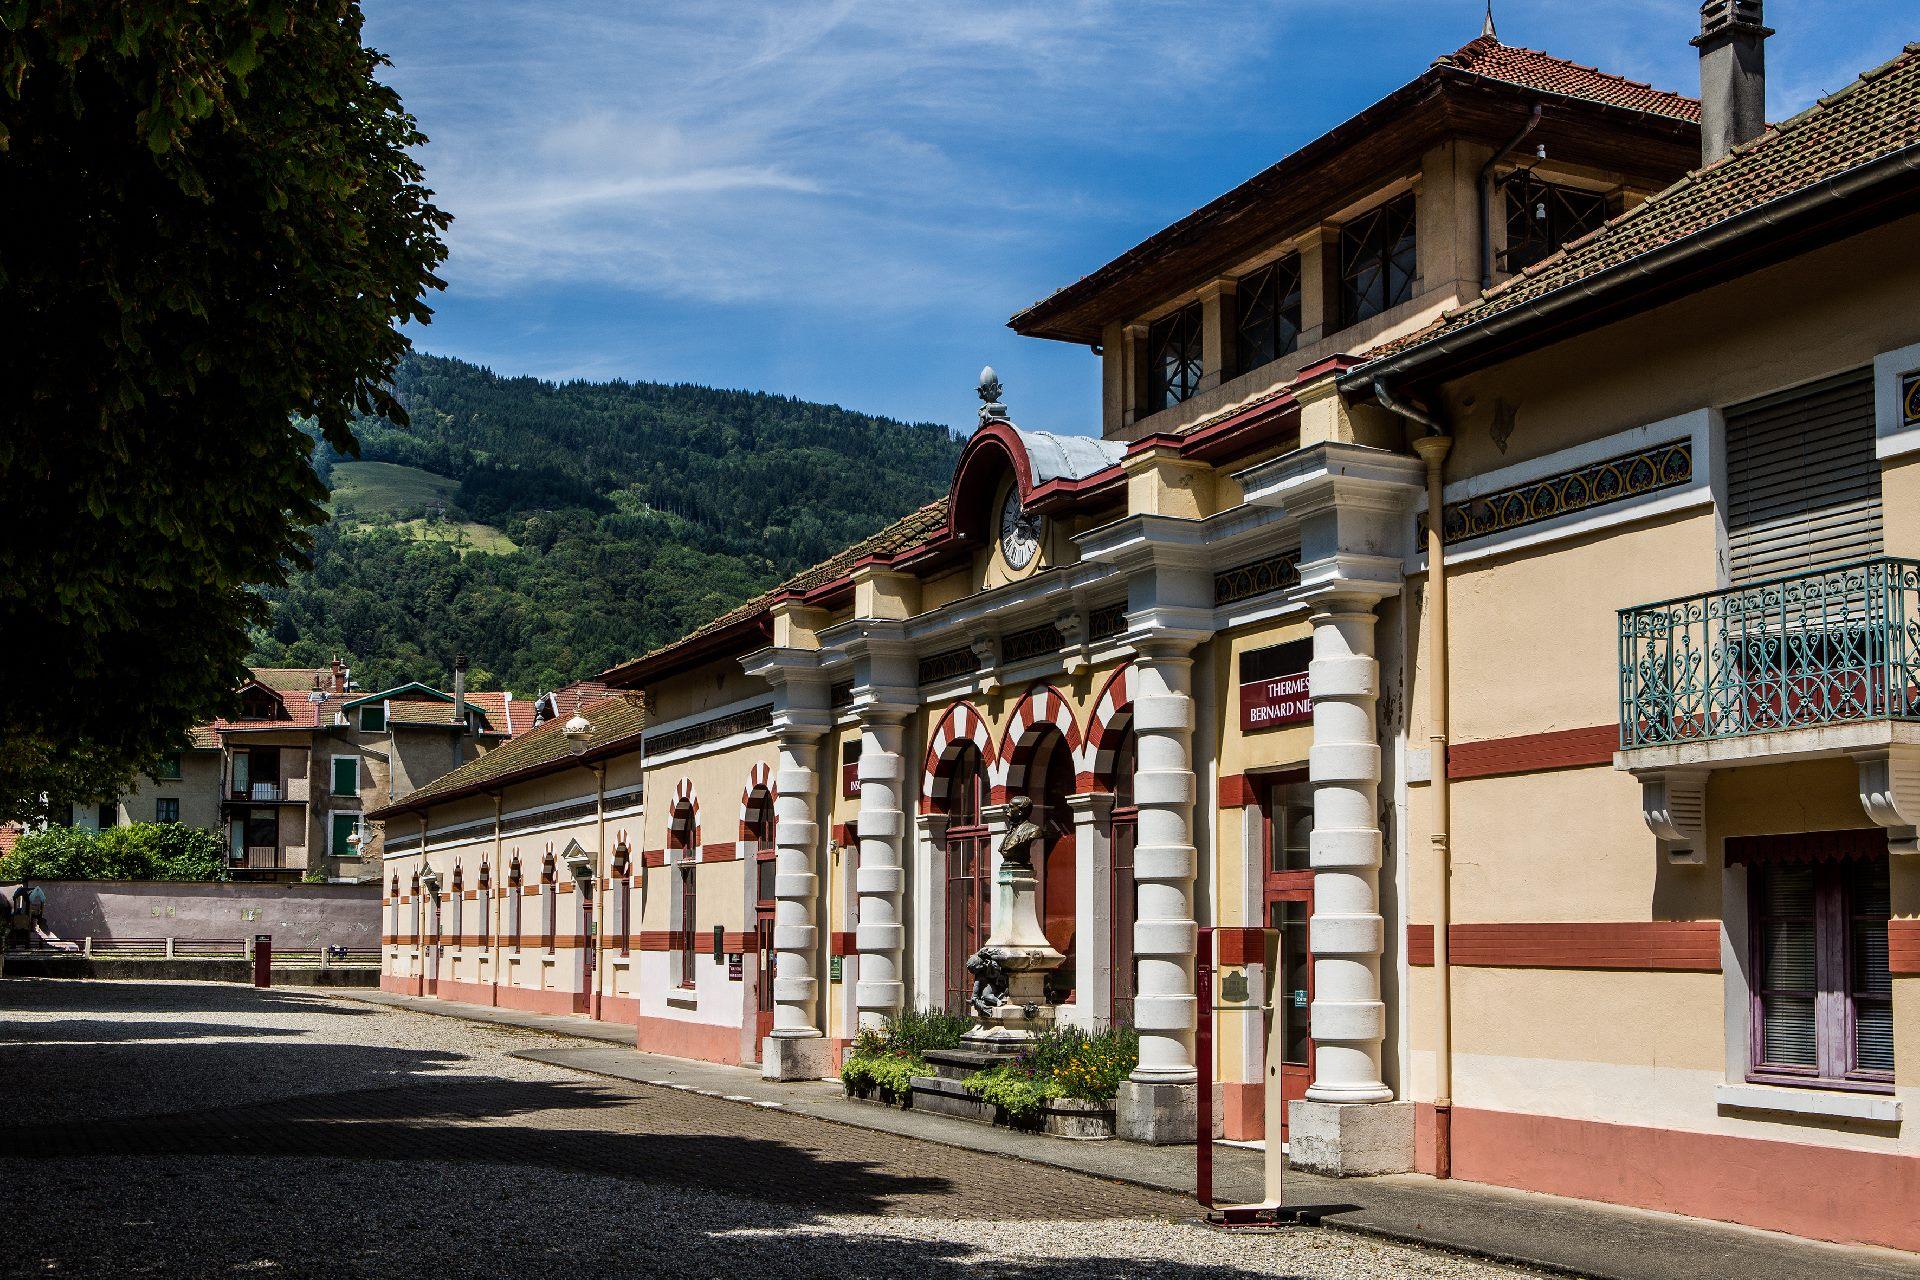 La station thermale d'Allevard